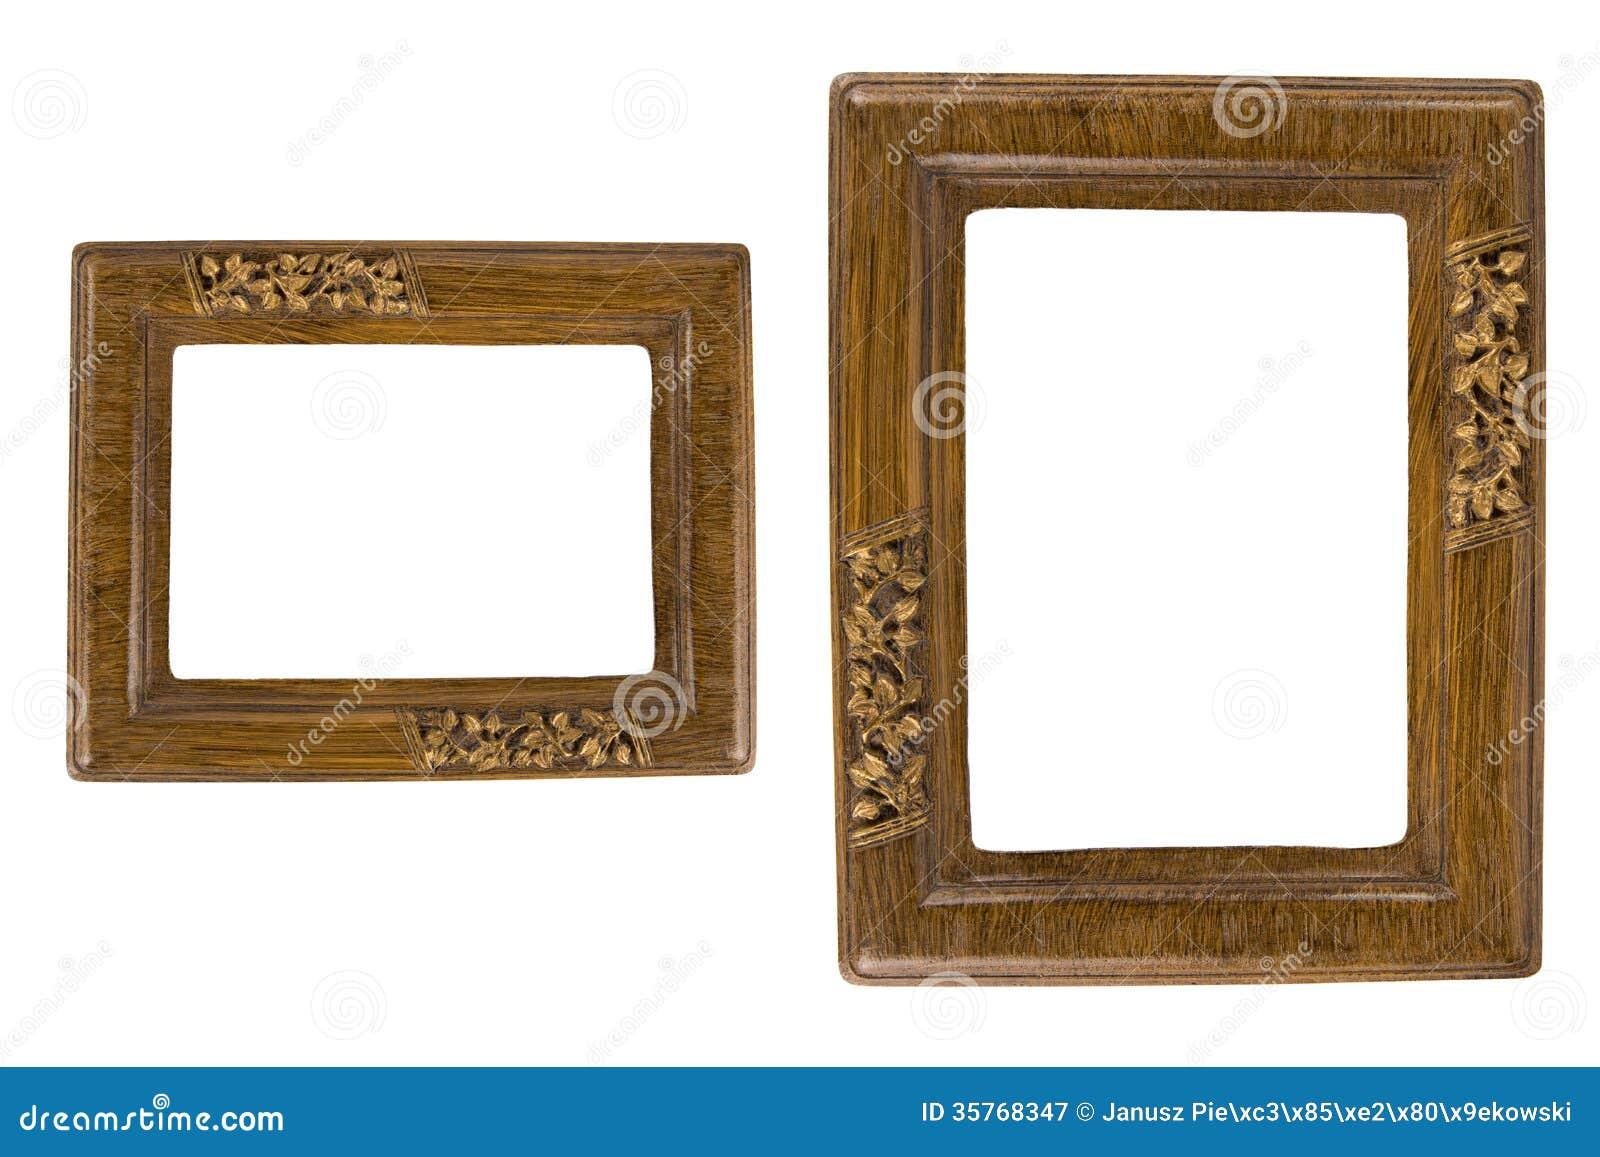 Zwei Retro- Fotorahmen stockbild. Bild von geschnitzt - 35768347